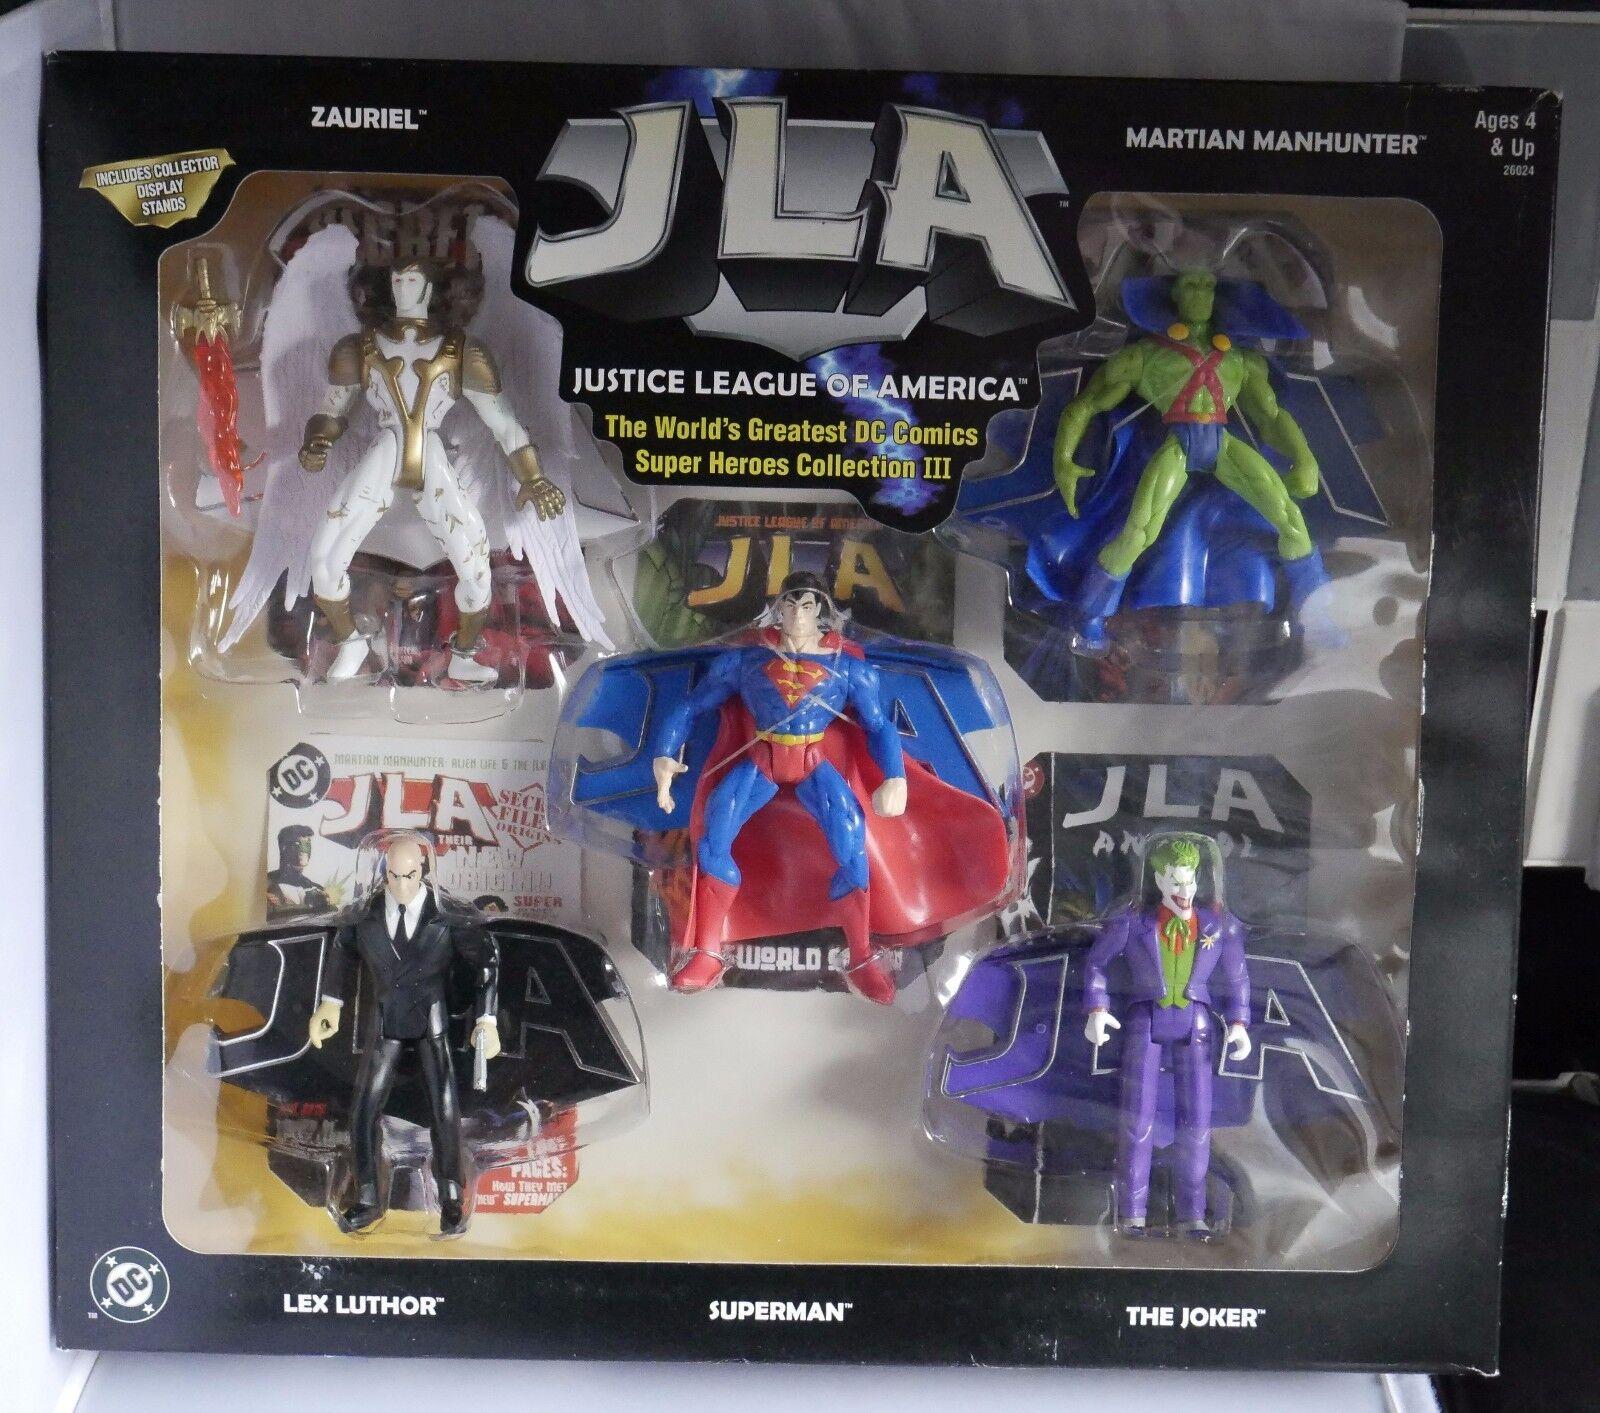 DC JUSTICE LEAGUE OF AMERICA Set 3 Incl Joker Lex Luthor Superman zauriel Figure